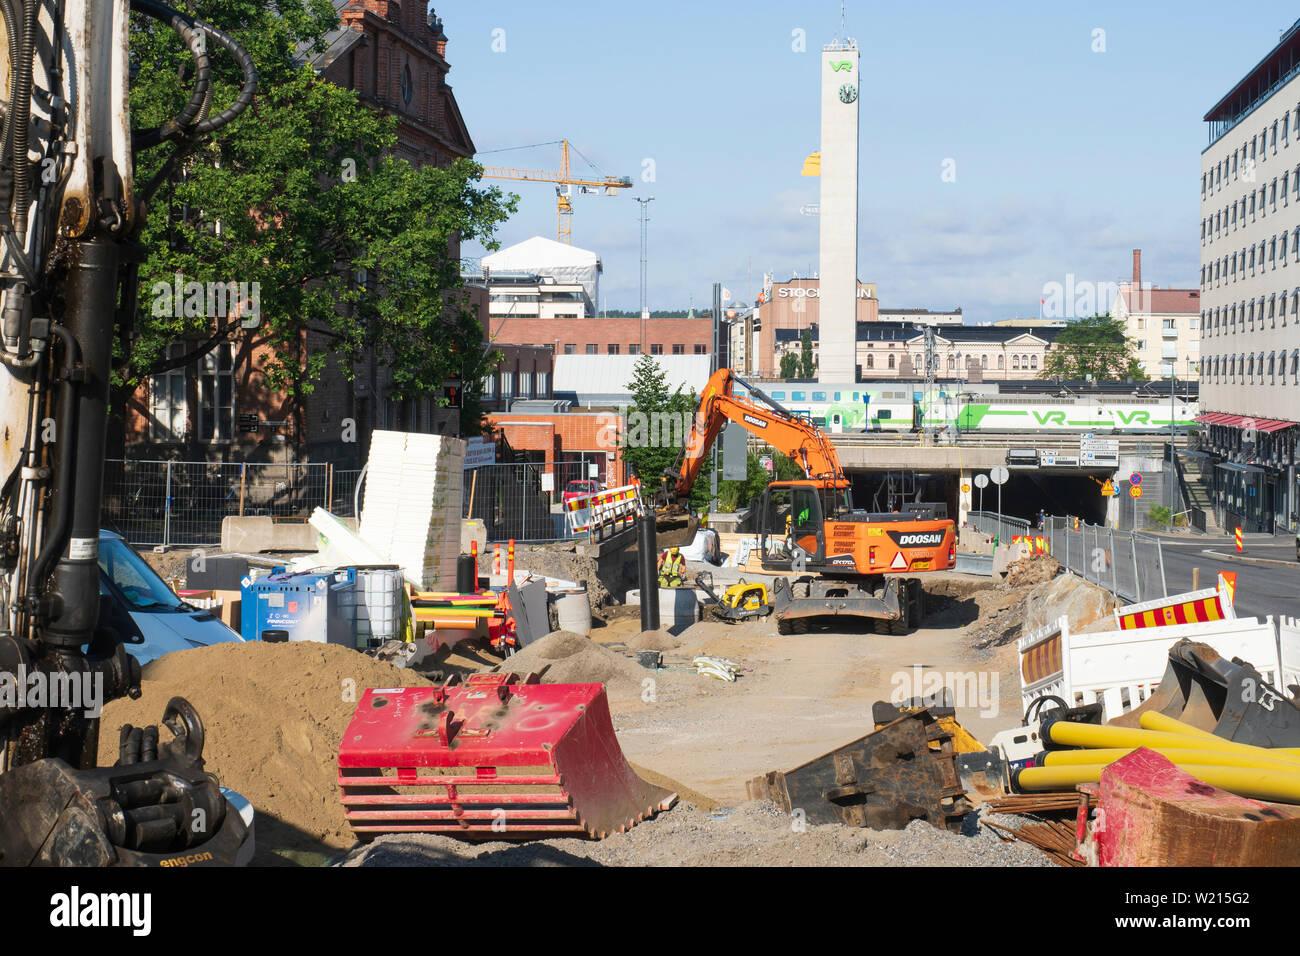 Building Tram Rails at itsenäisyydenkatu Street in Tampere Finland - Stock Image